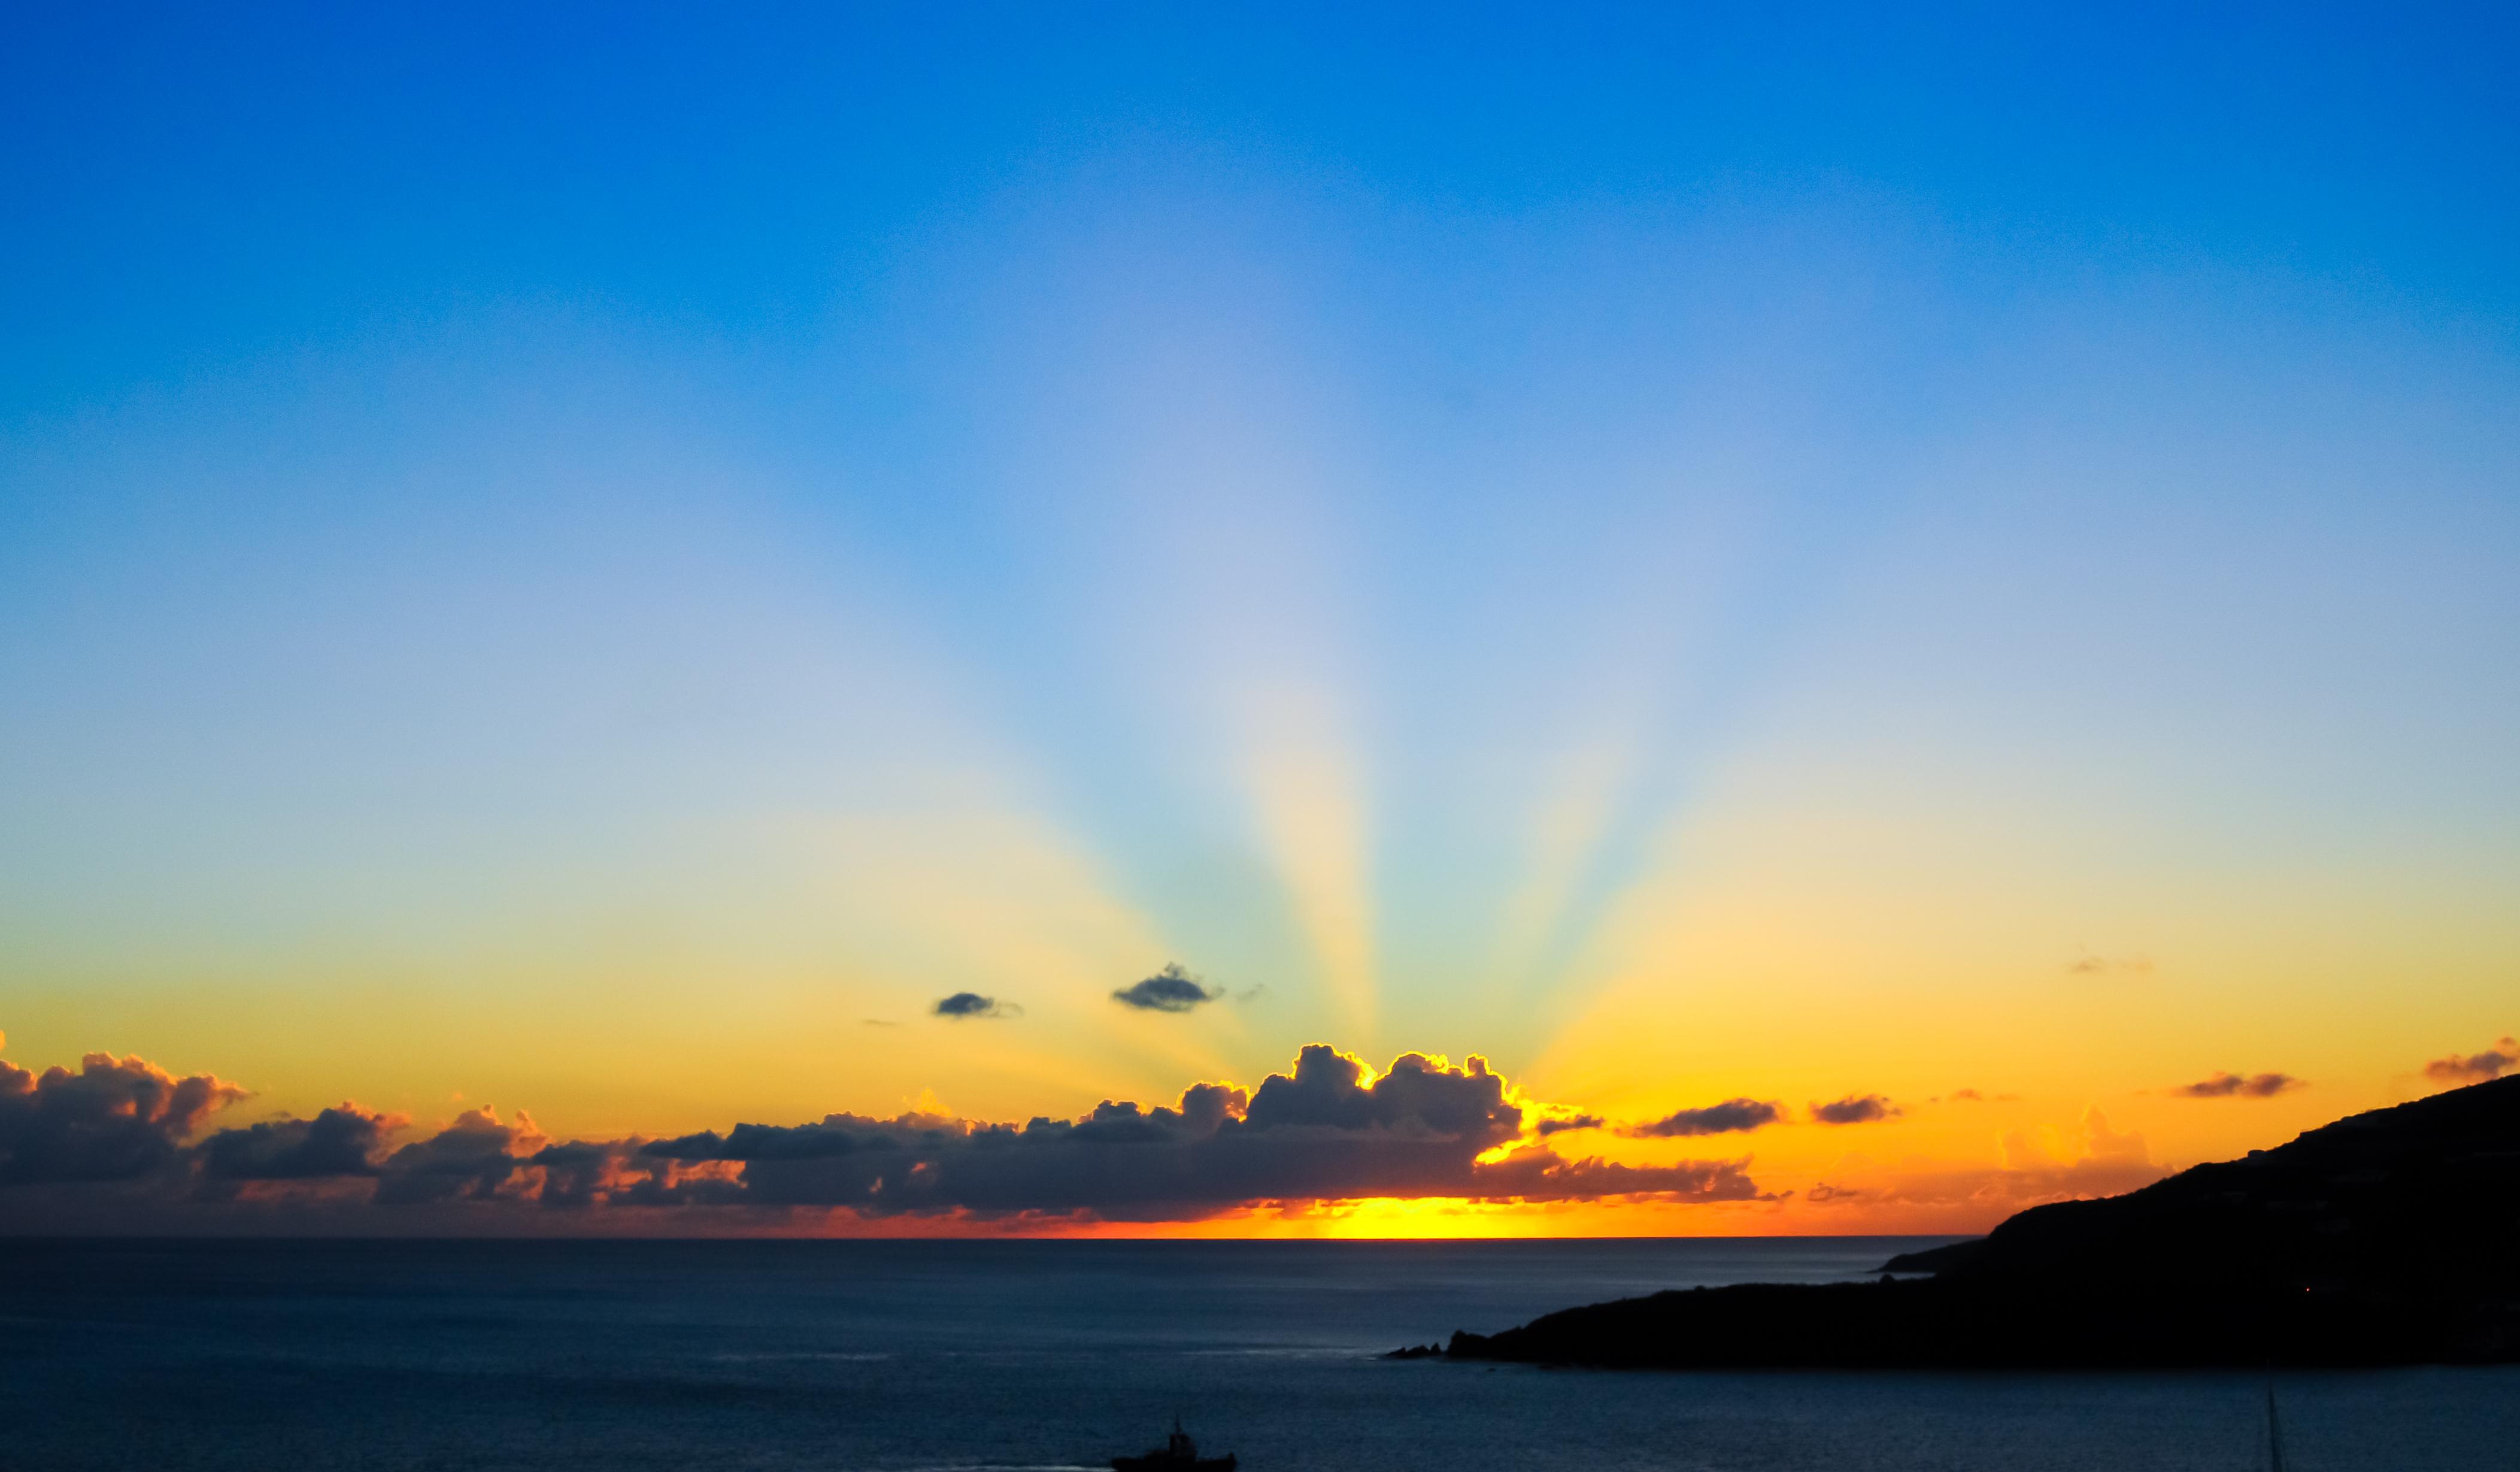 The Dawn of Sainthood